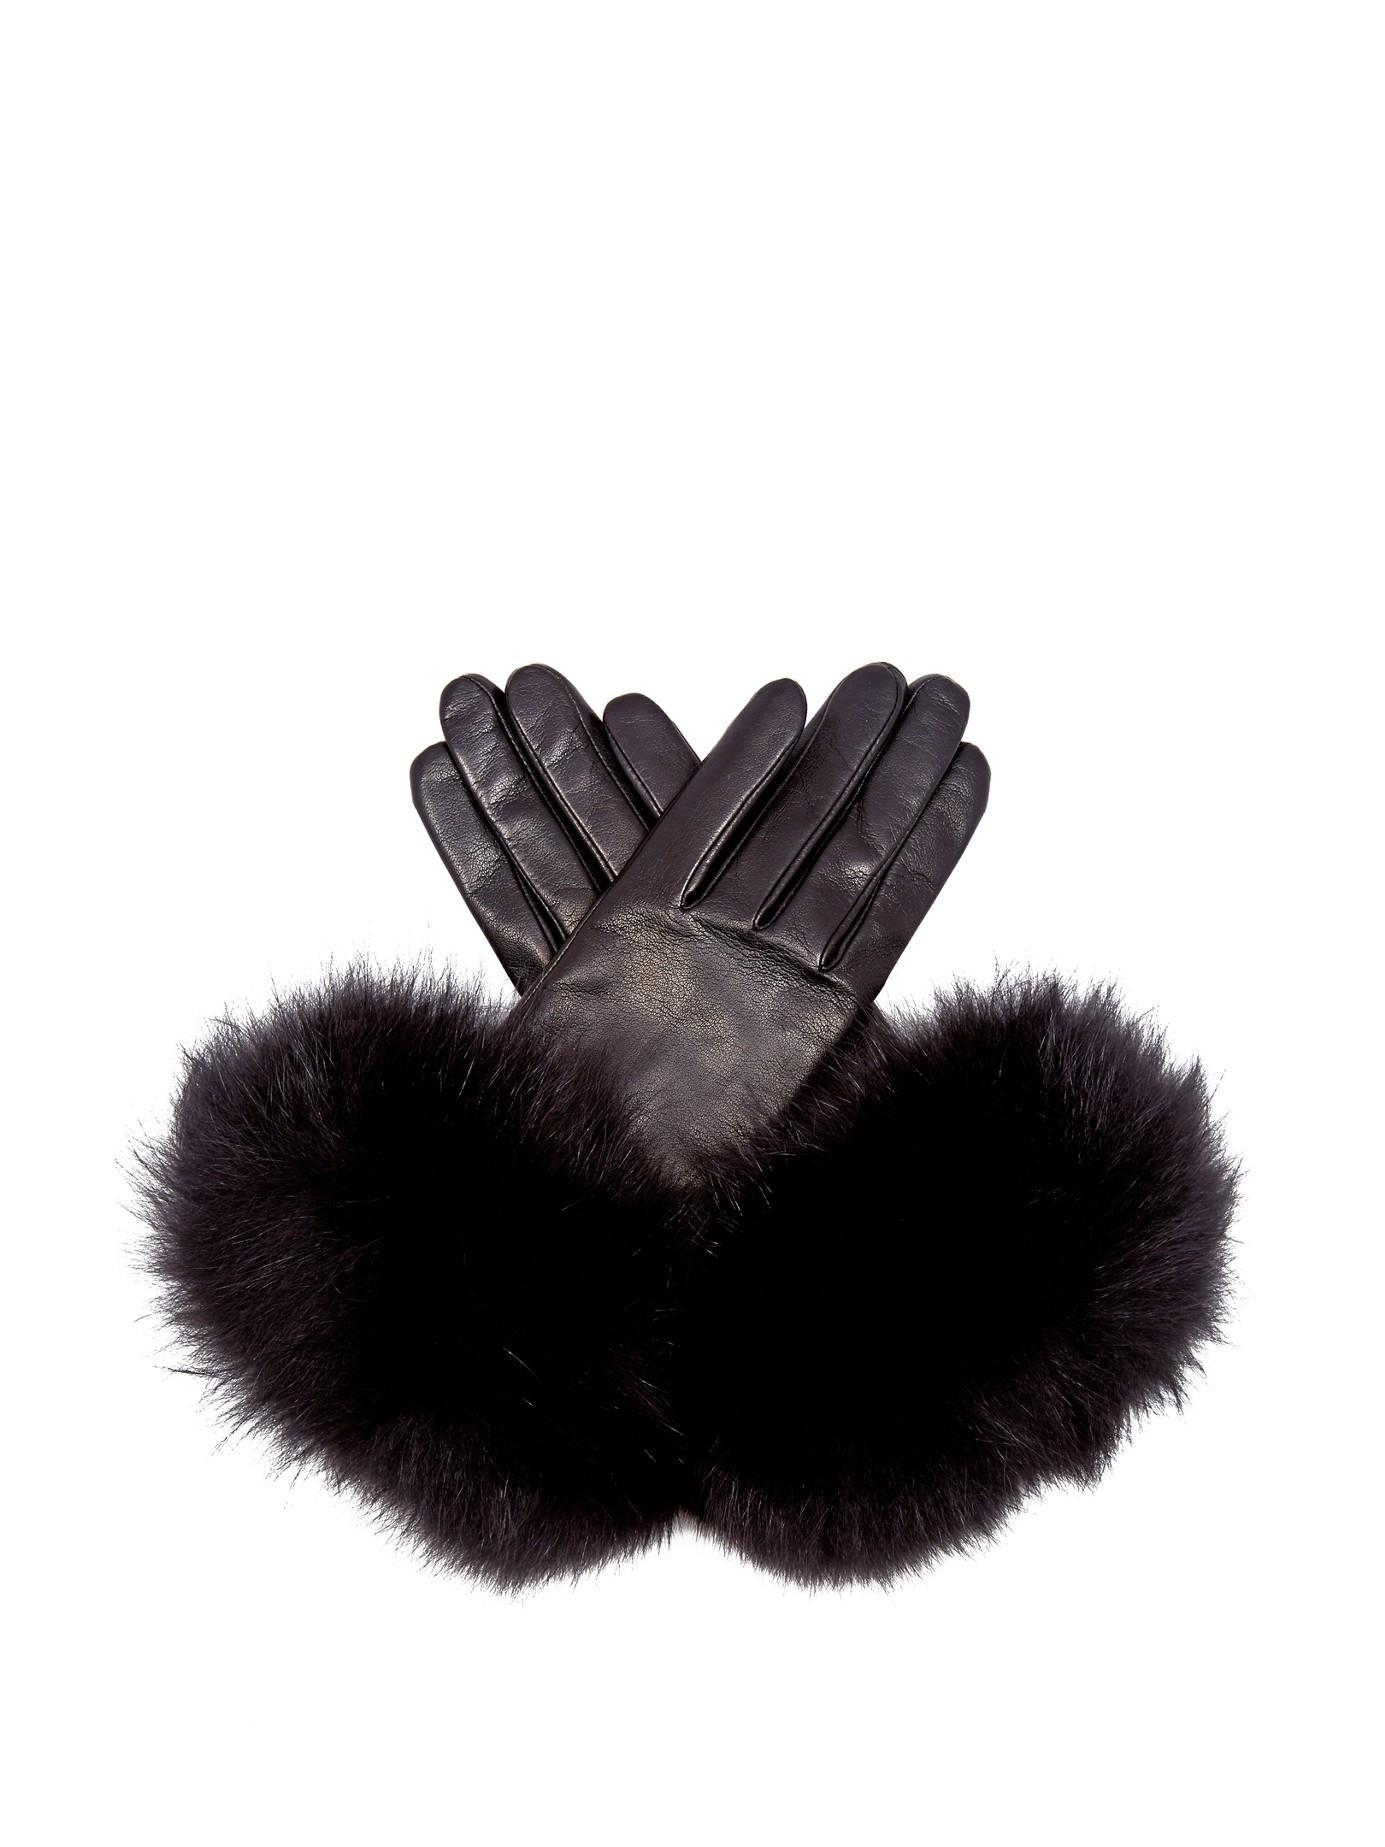 Black gloves with leopard trim - Gallery